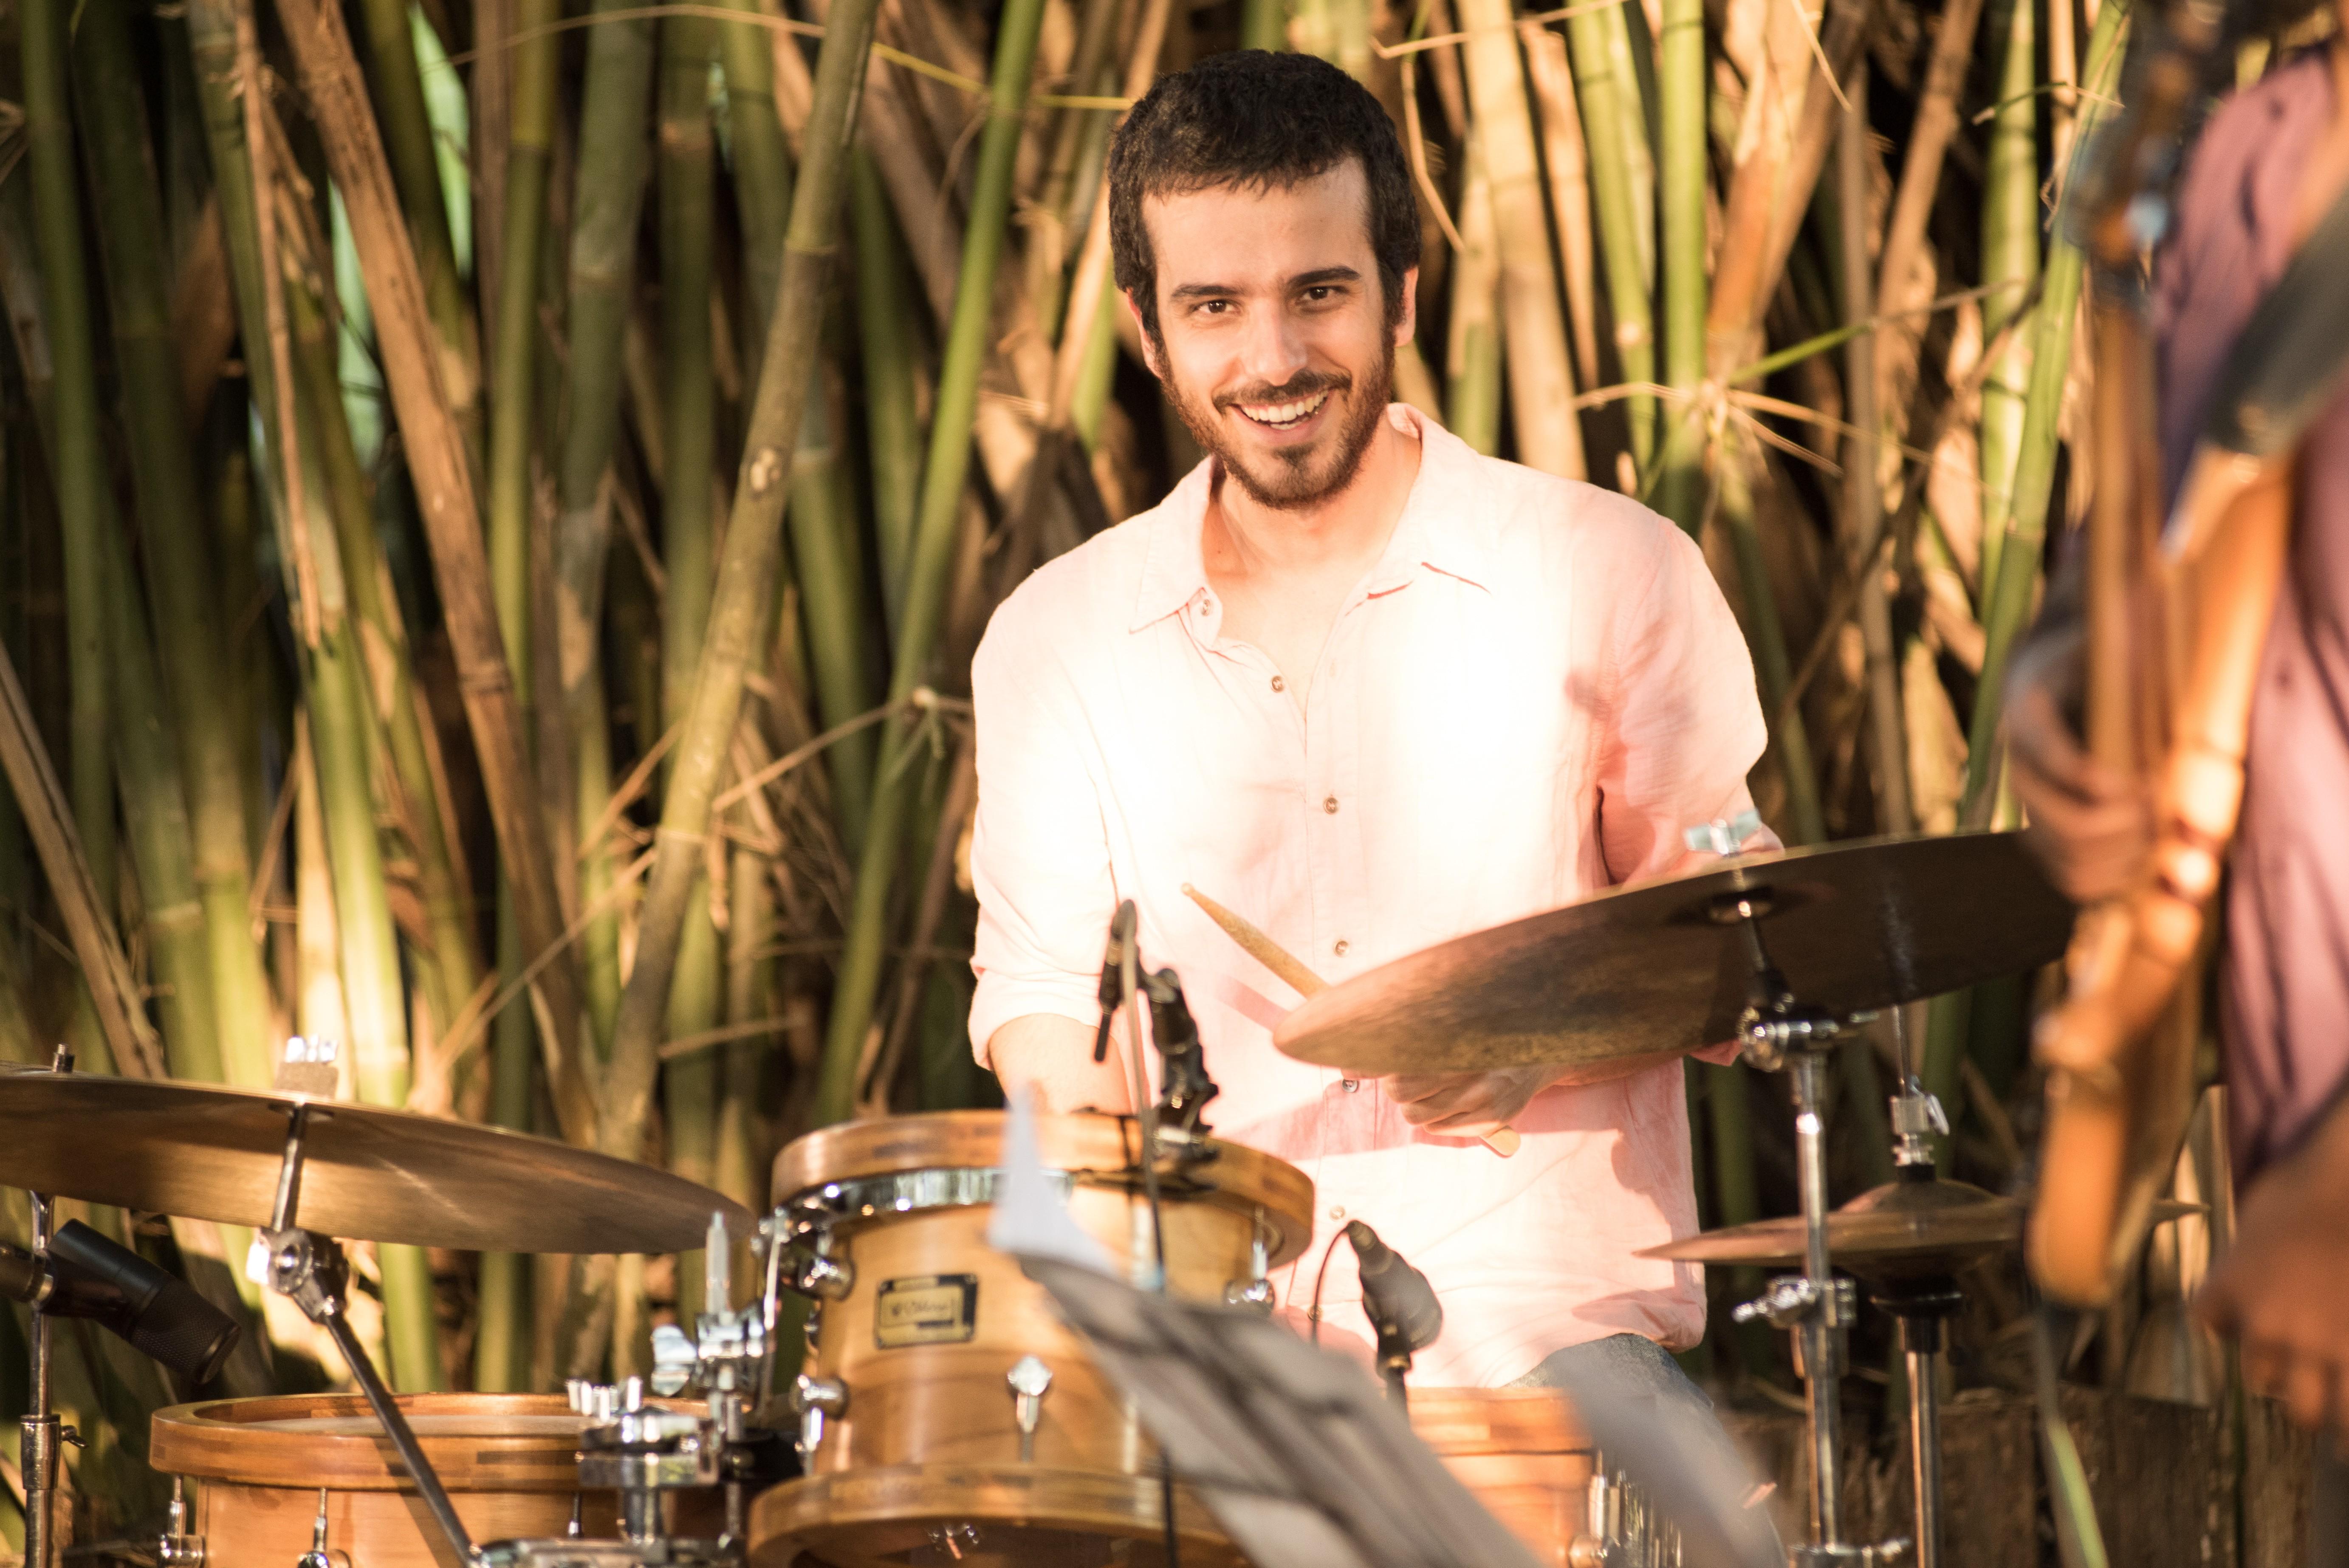 Joao Casimiro